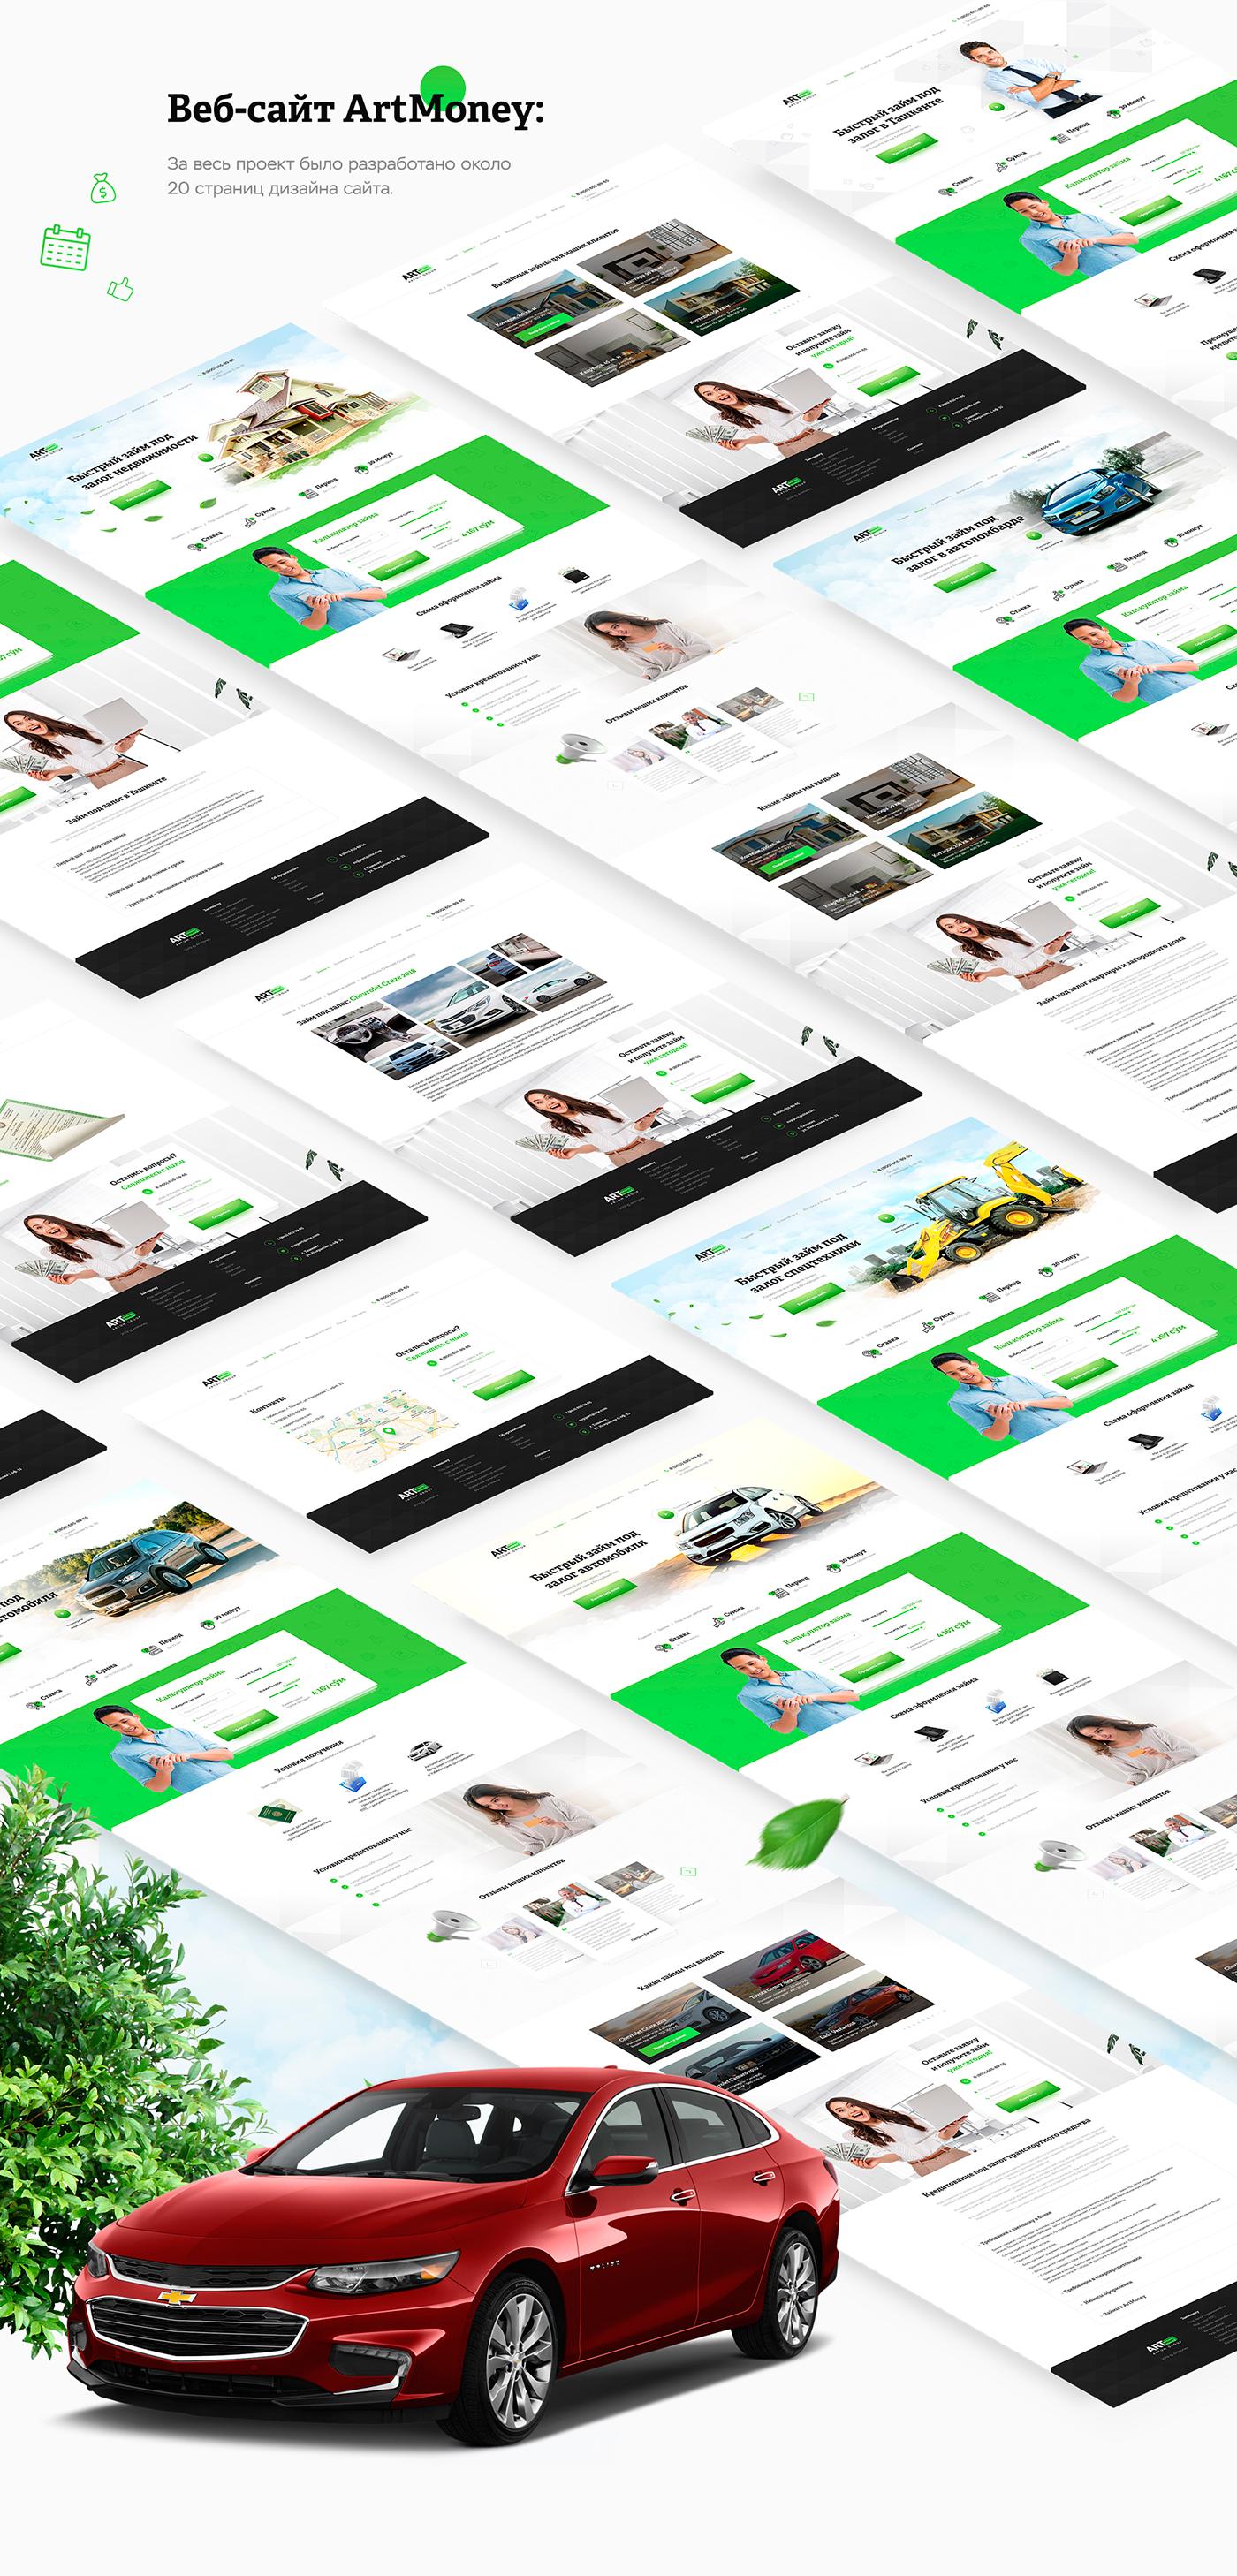 design webdesifn Website landingpage art money artmoney landing brandbook uiux